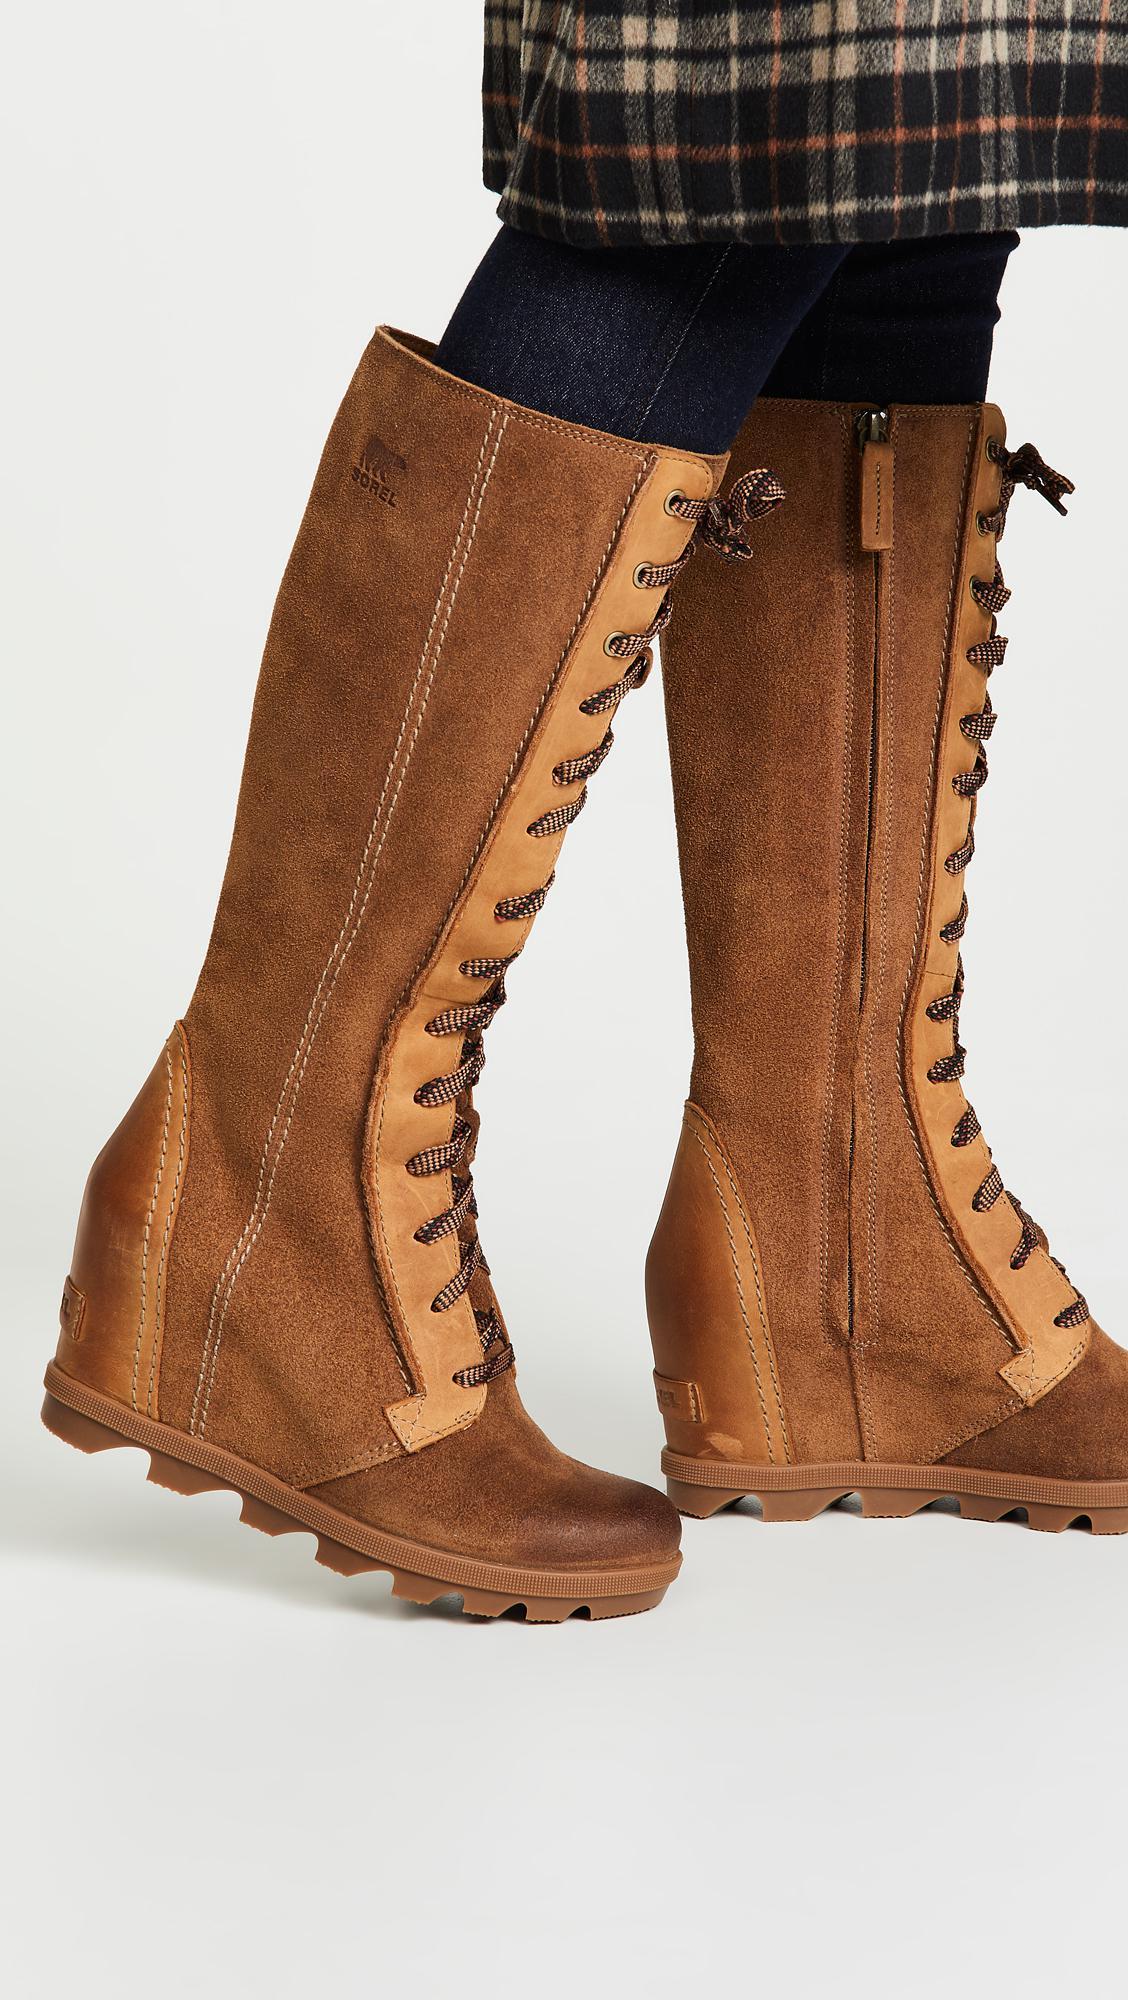 23a86d3c1ba7 Sorel - Brown Joan Of Arctic Wedge Ii Tall Boots - Lyst. View fullscreen